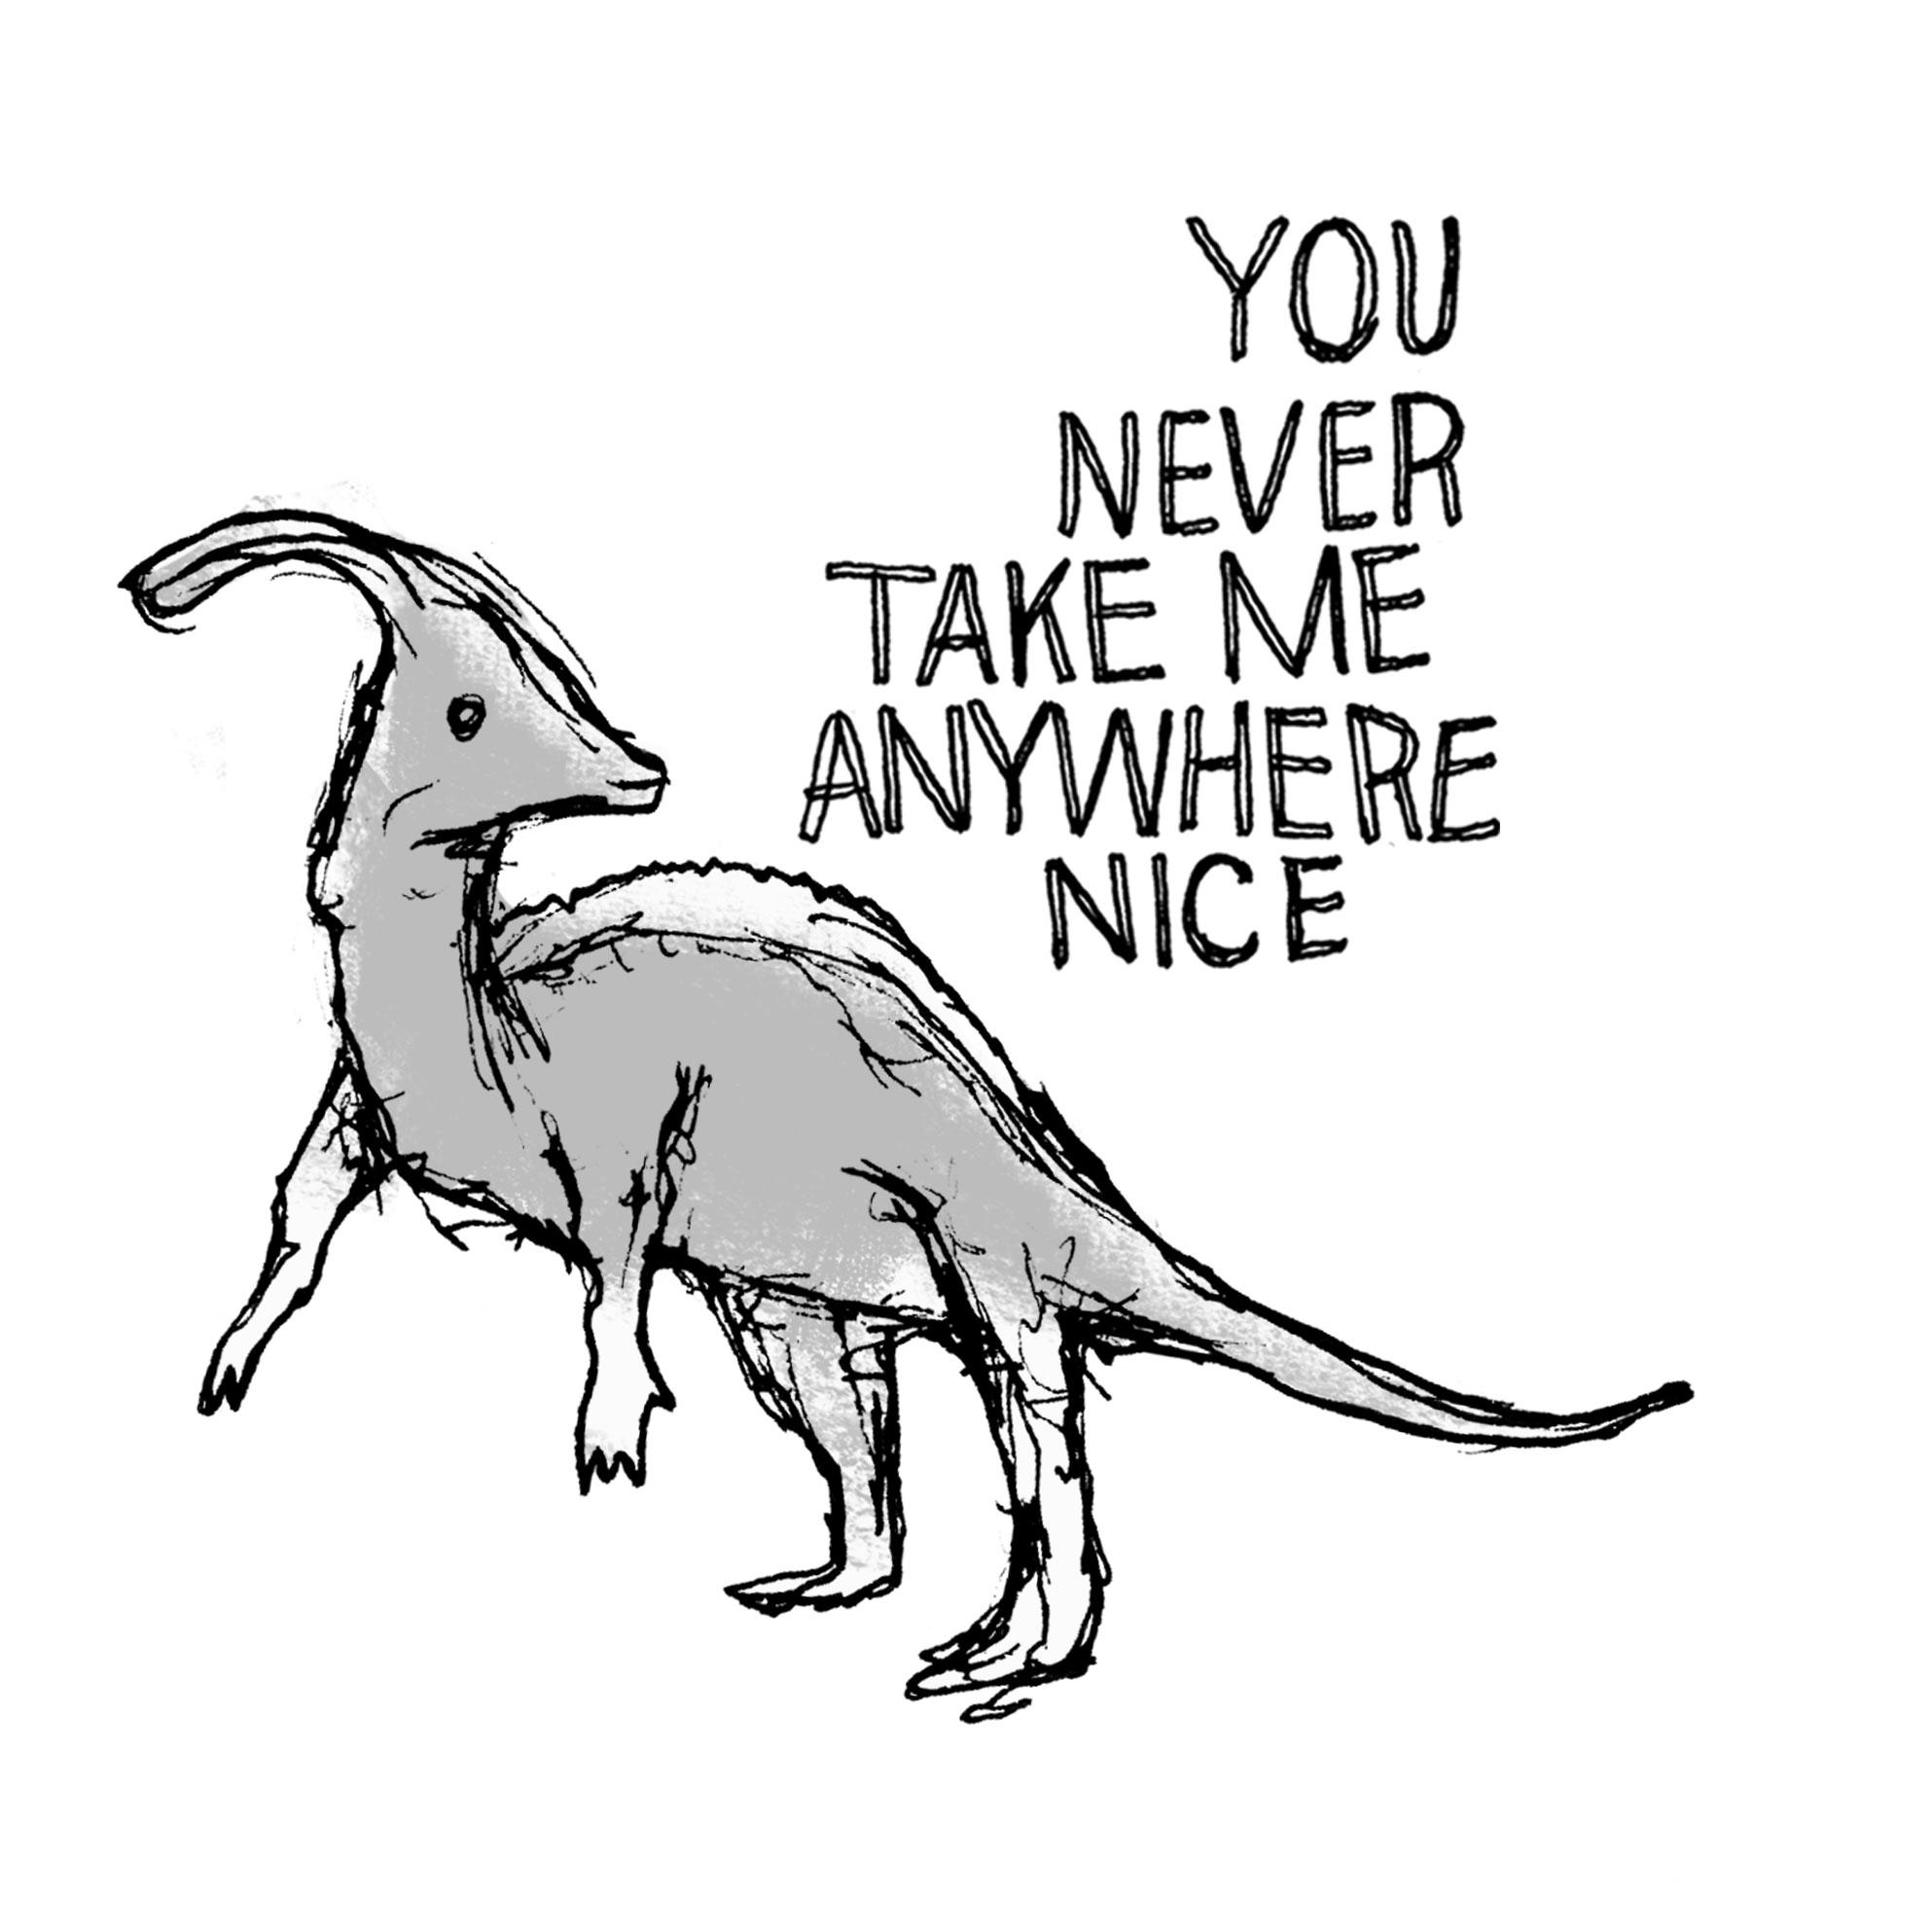 YOU-NEVER-TAKE-ME-ANYWHERE-NICE_keg_cap.jpg